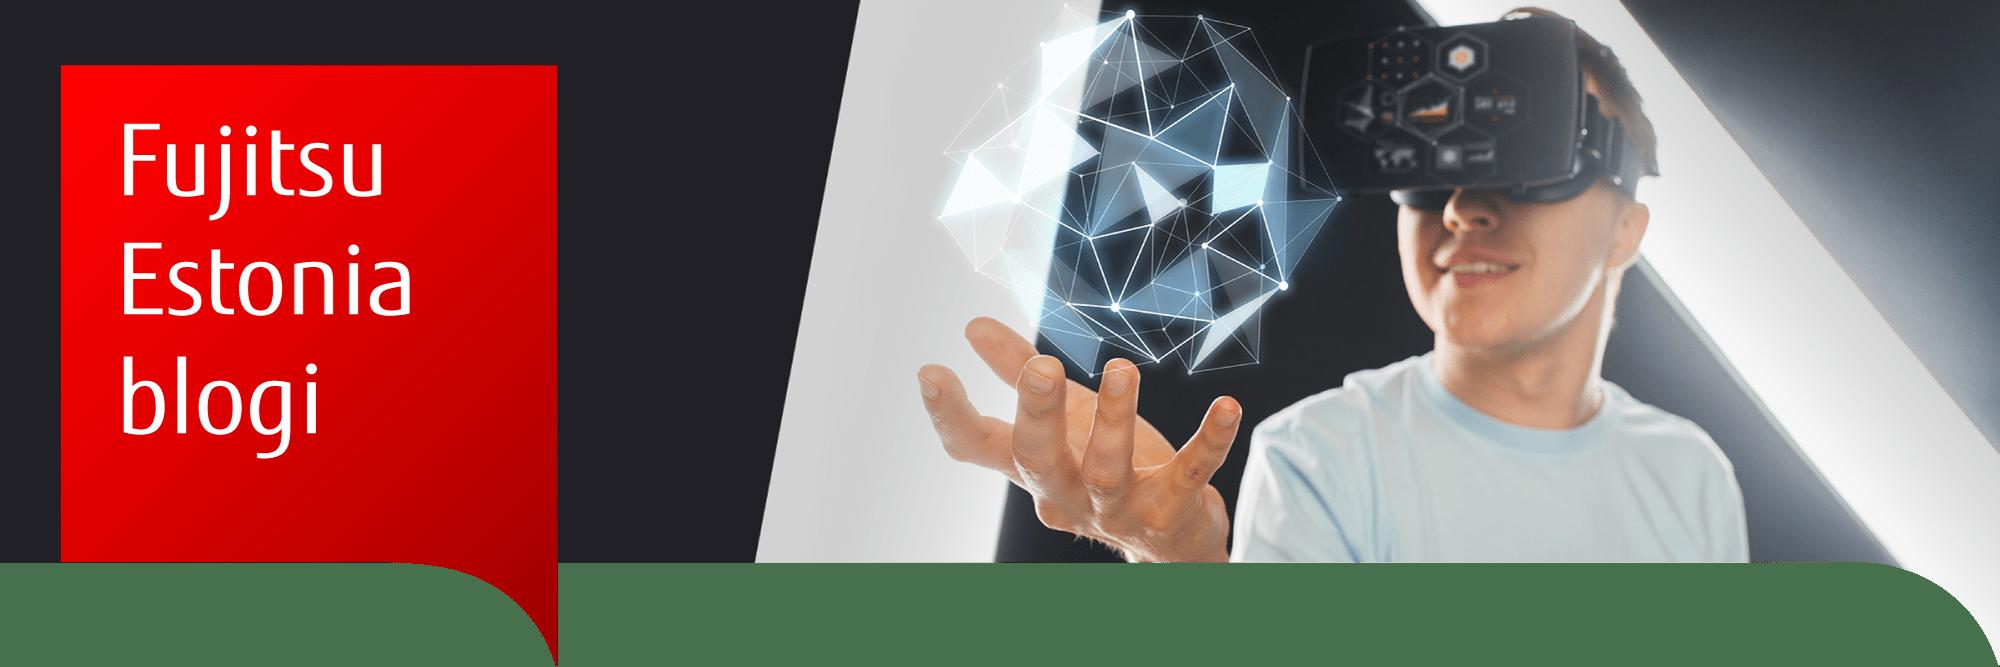 Fujitsu Estonia Blogi